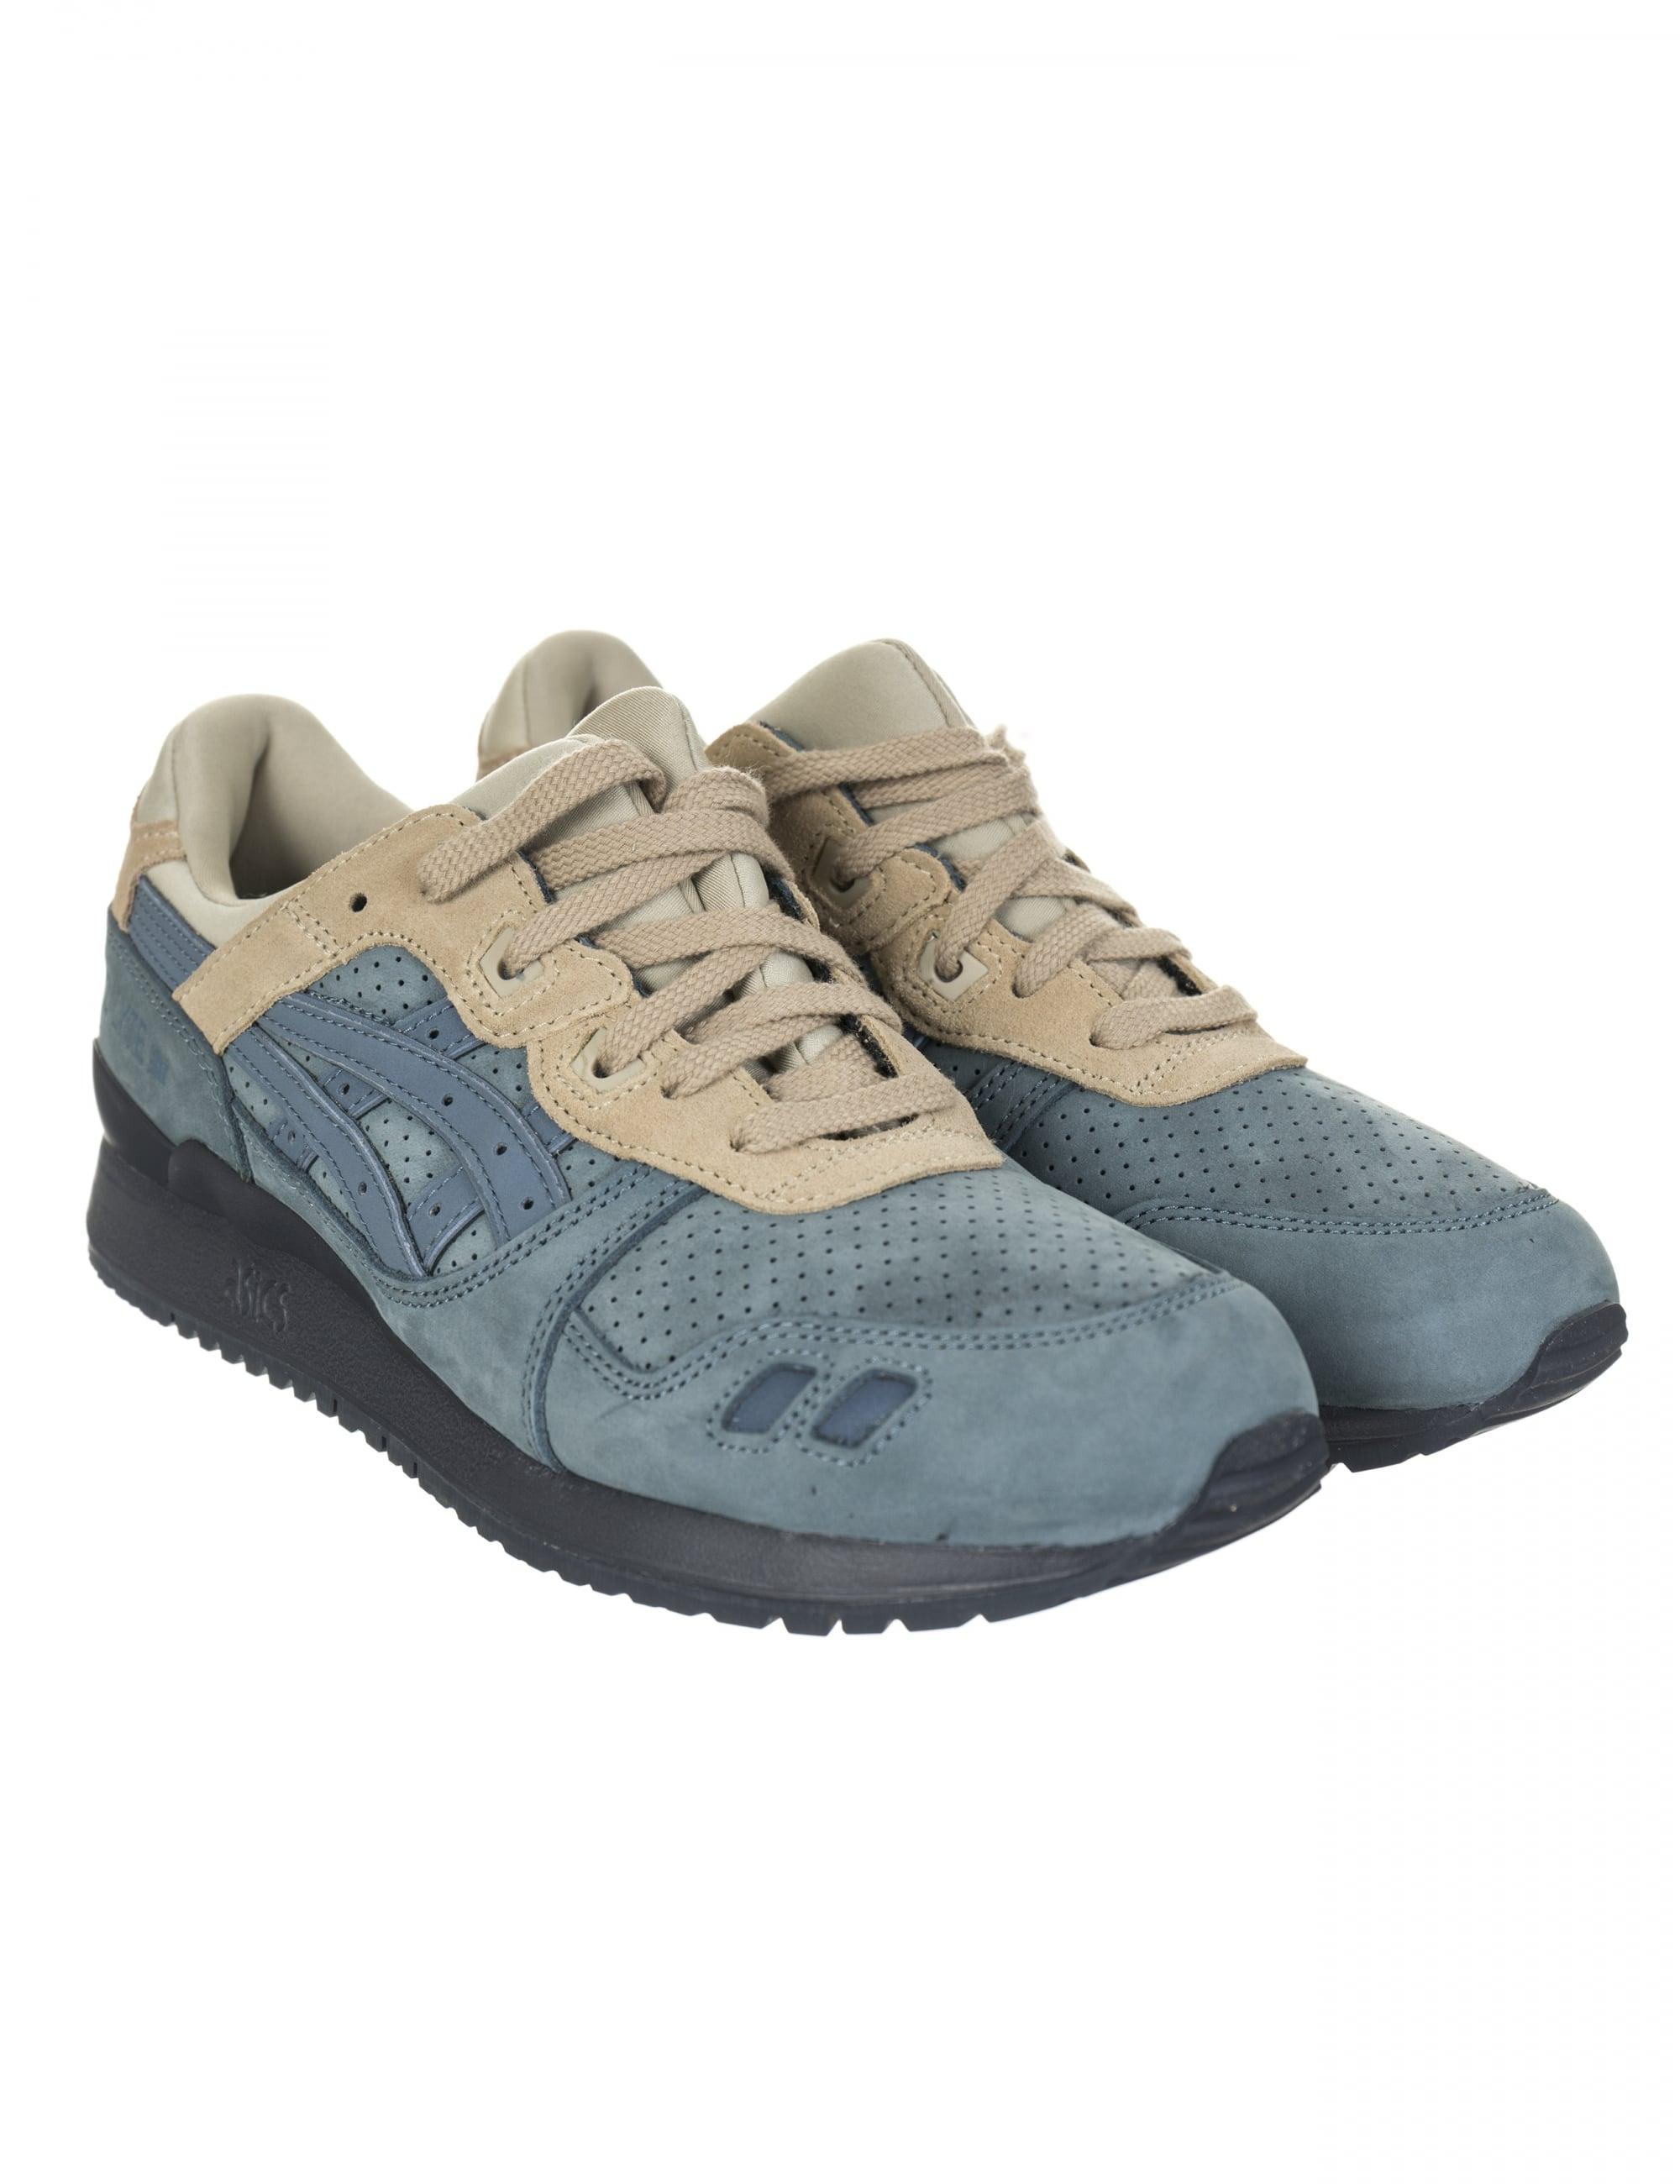 Asics Gel Lyte III Shoes - Blue Mirage